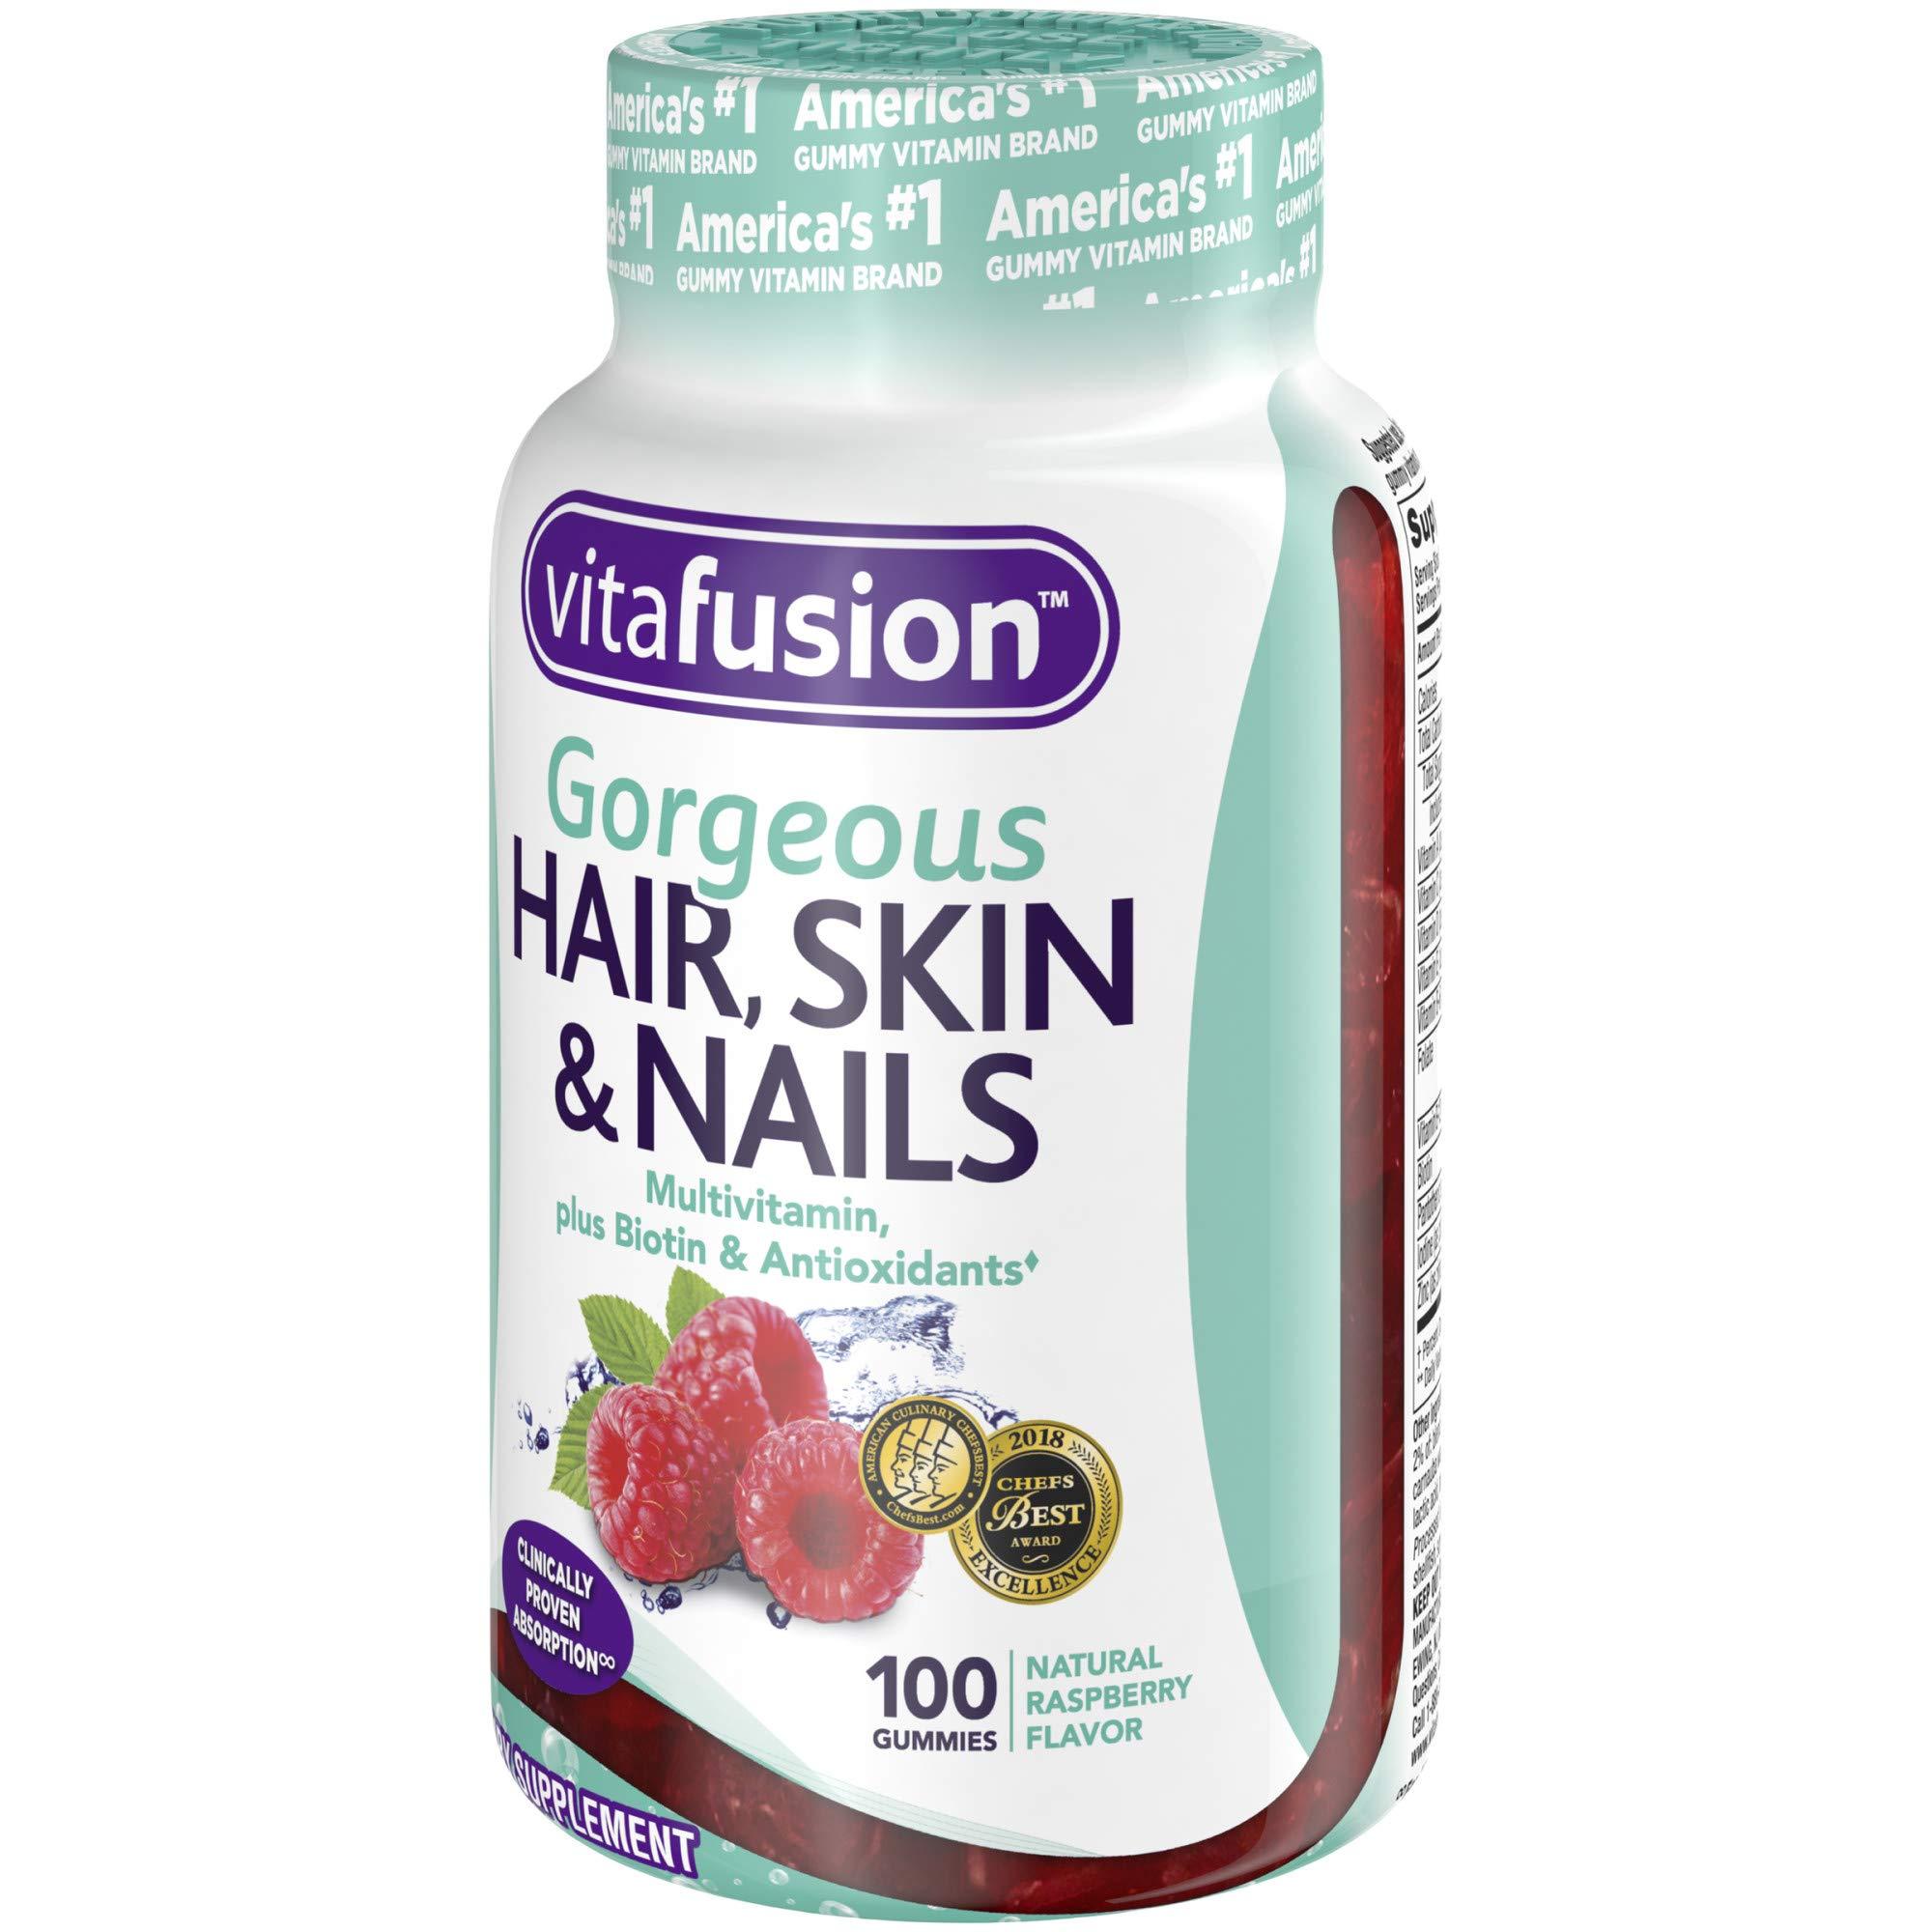 Vitafusion Gorgeous Hair Skin And Nails 41